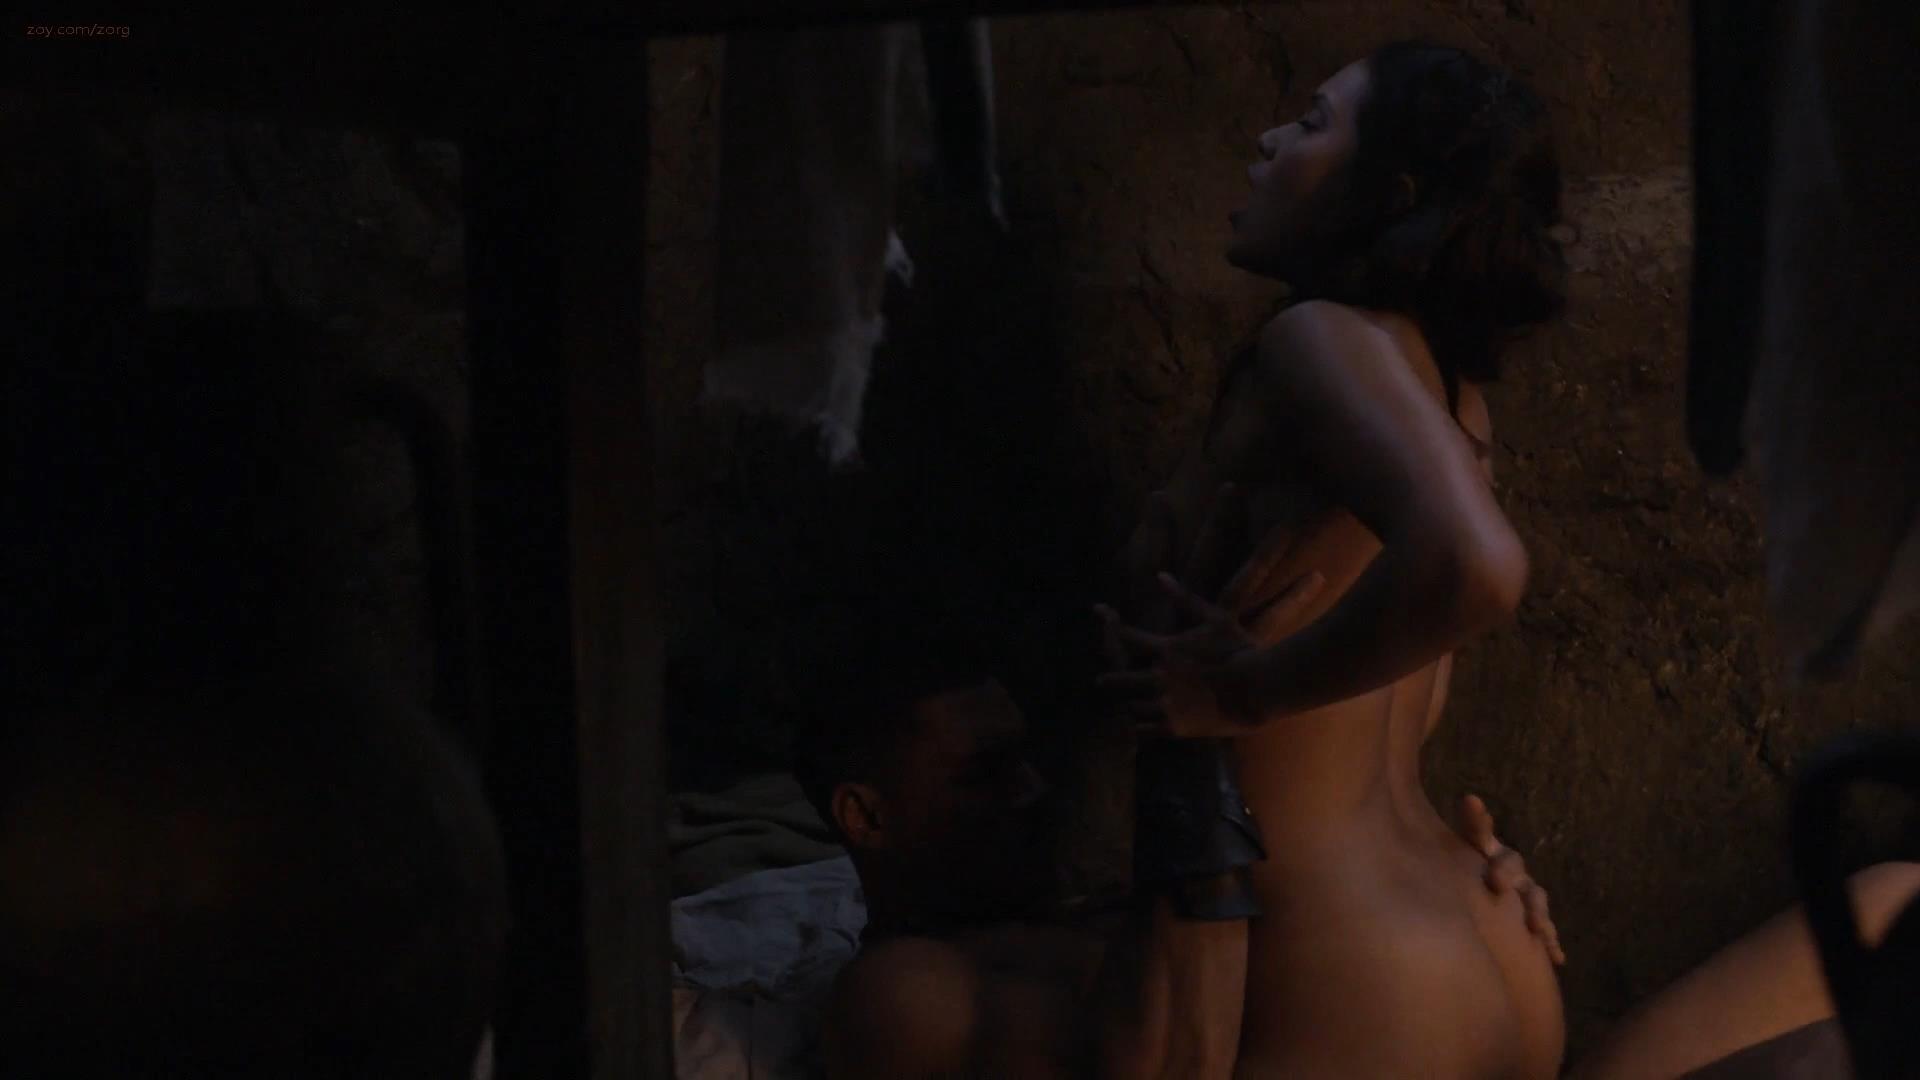 Natalie colombian porn star